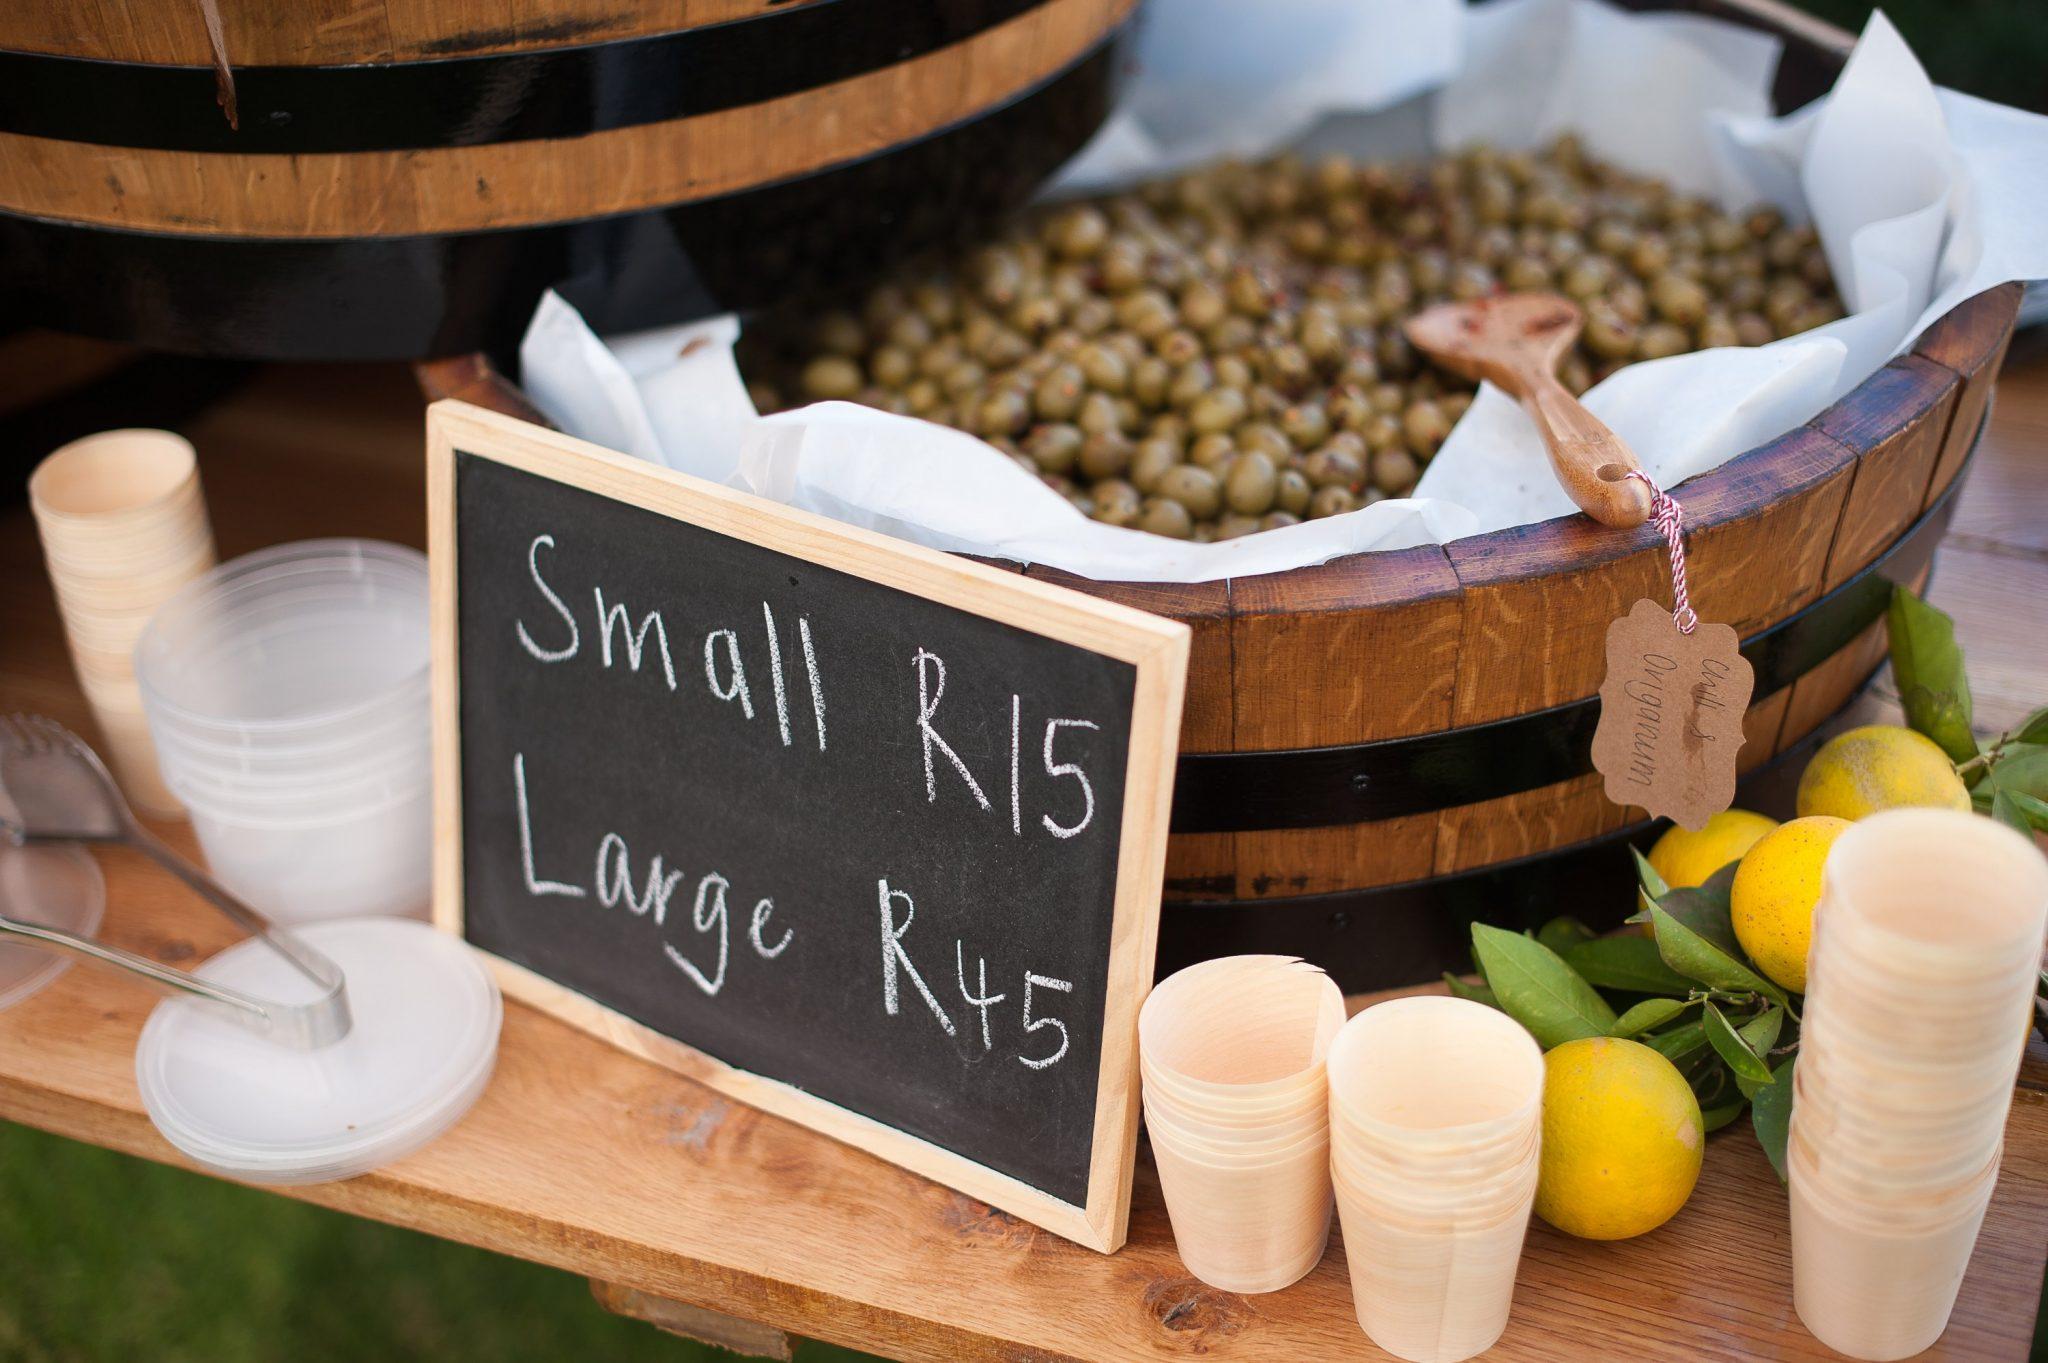 olives arw shiraz charcuterie sonia cabano blog eatdrinkcapetown